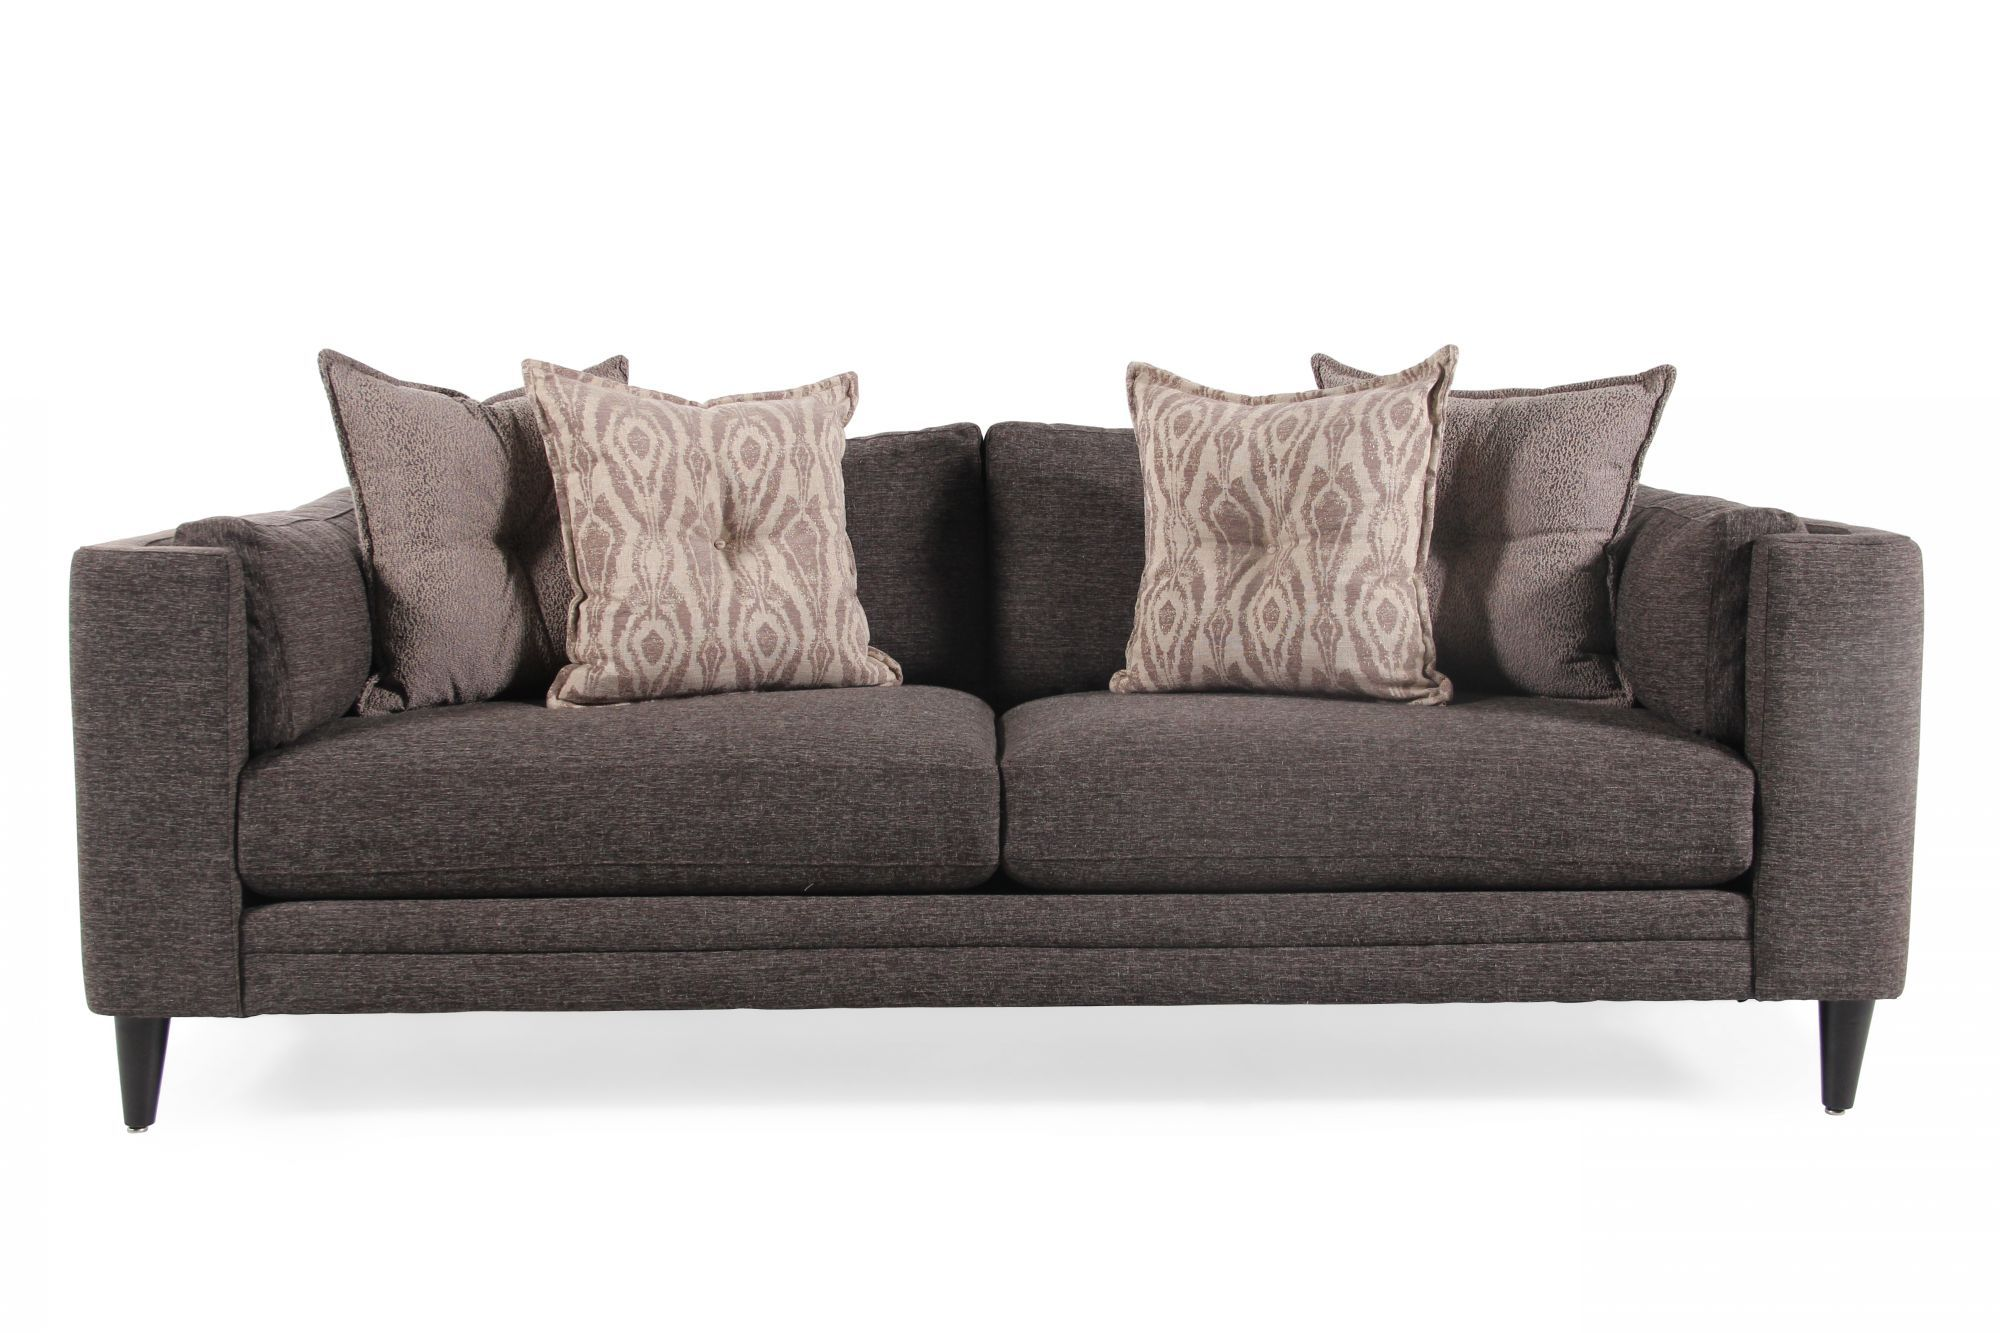 Jonathan Louis Isaac Sofa Mathis Brothers Furniture 886 95